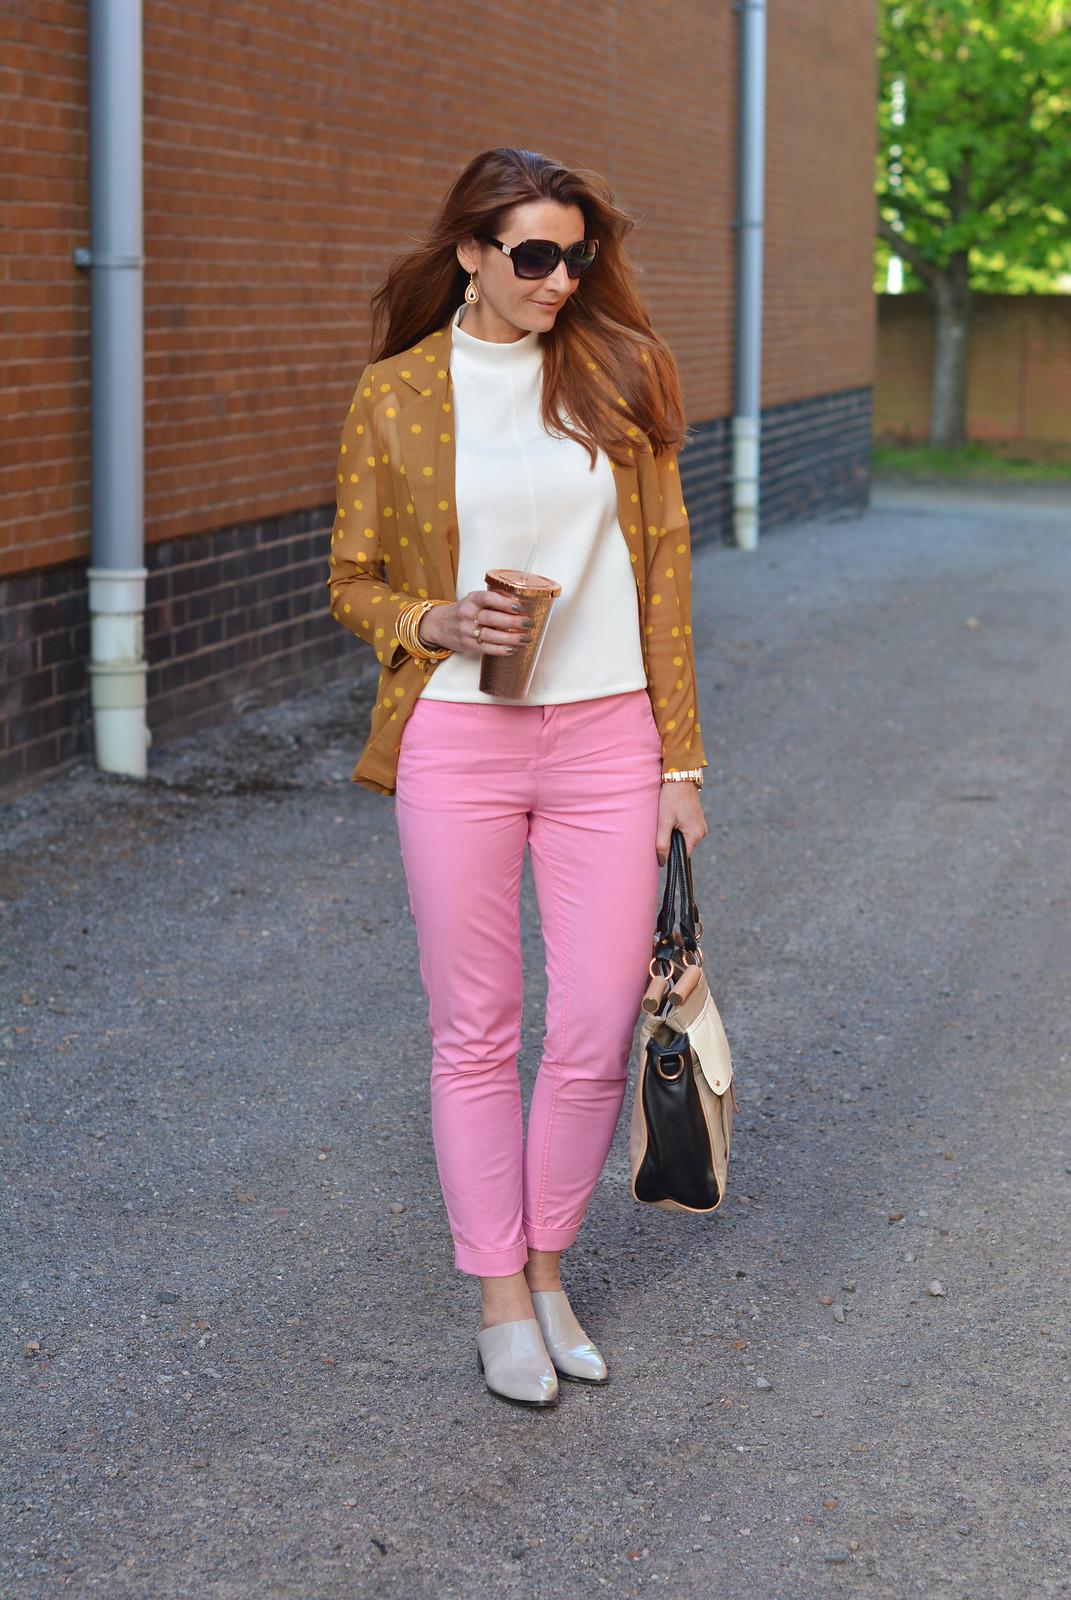 Springtime brights: Mustard polka dot blazer, pink chinos, taupe mules